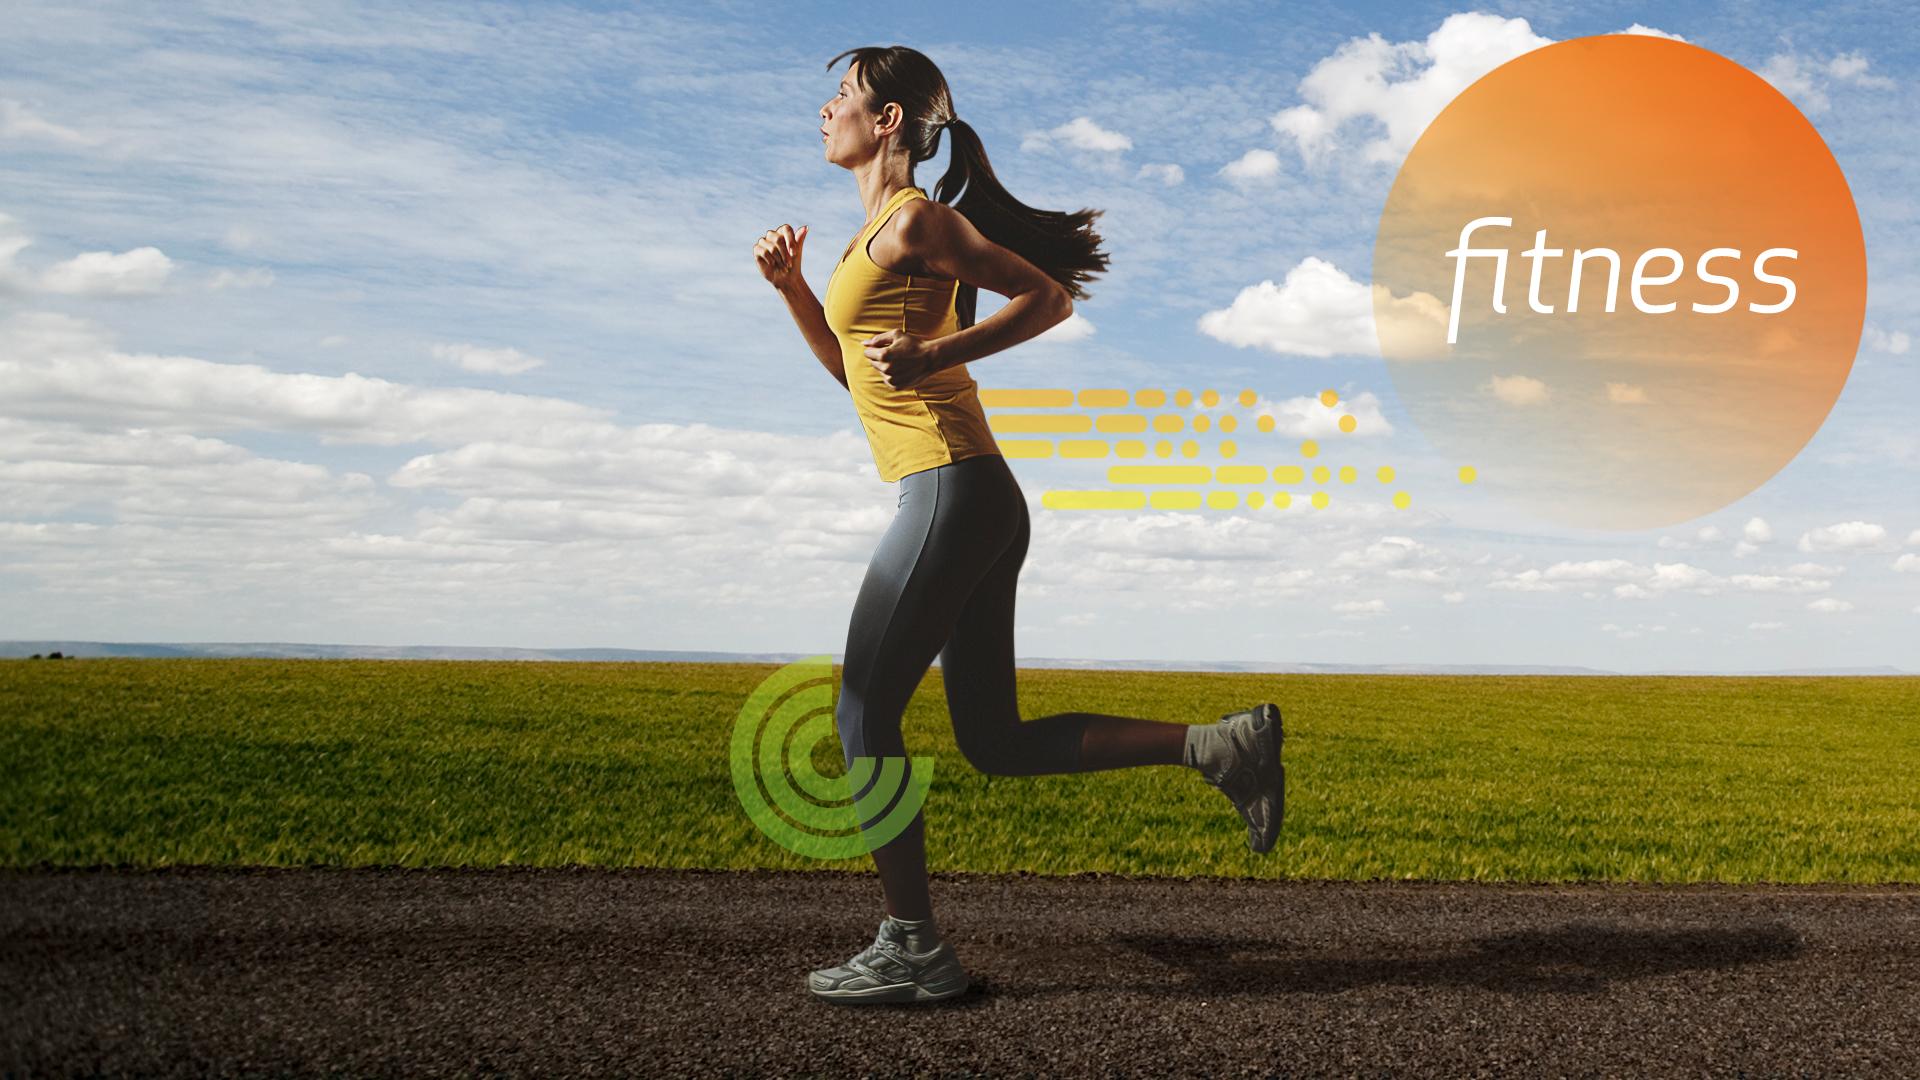 att_lifestyle_fitness3.jpg